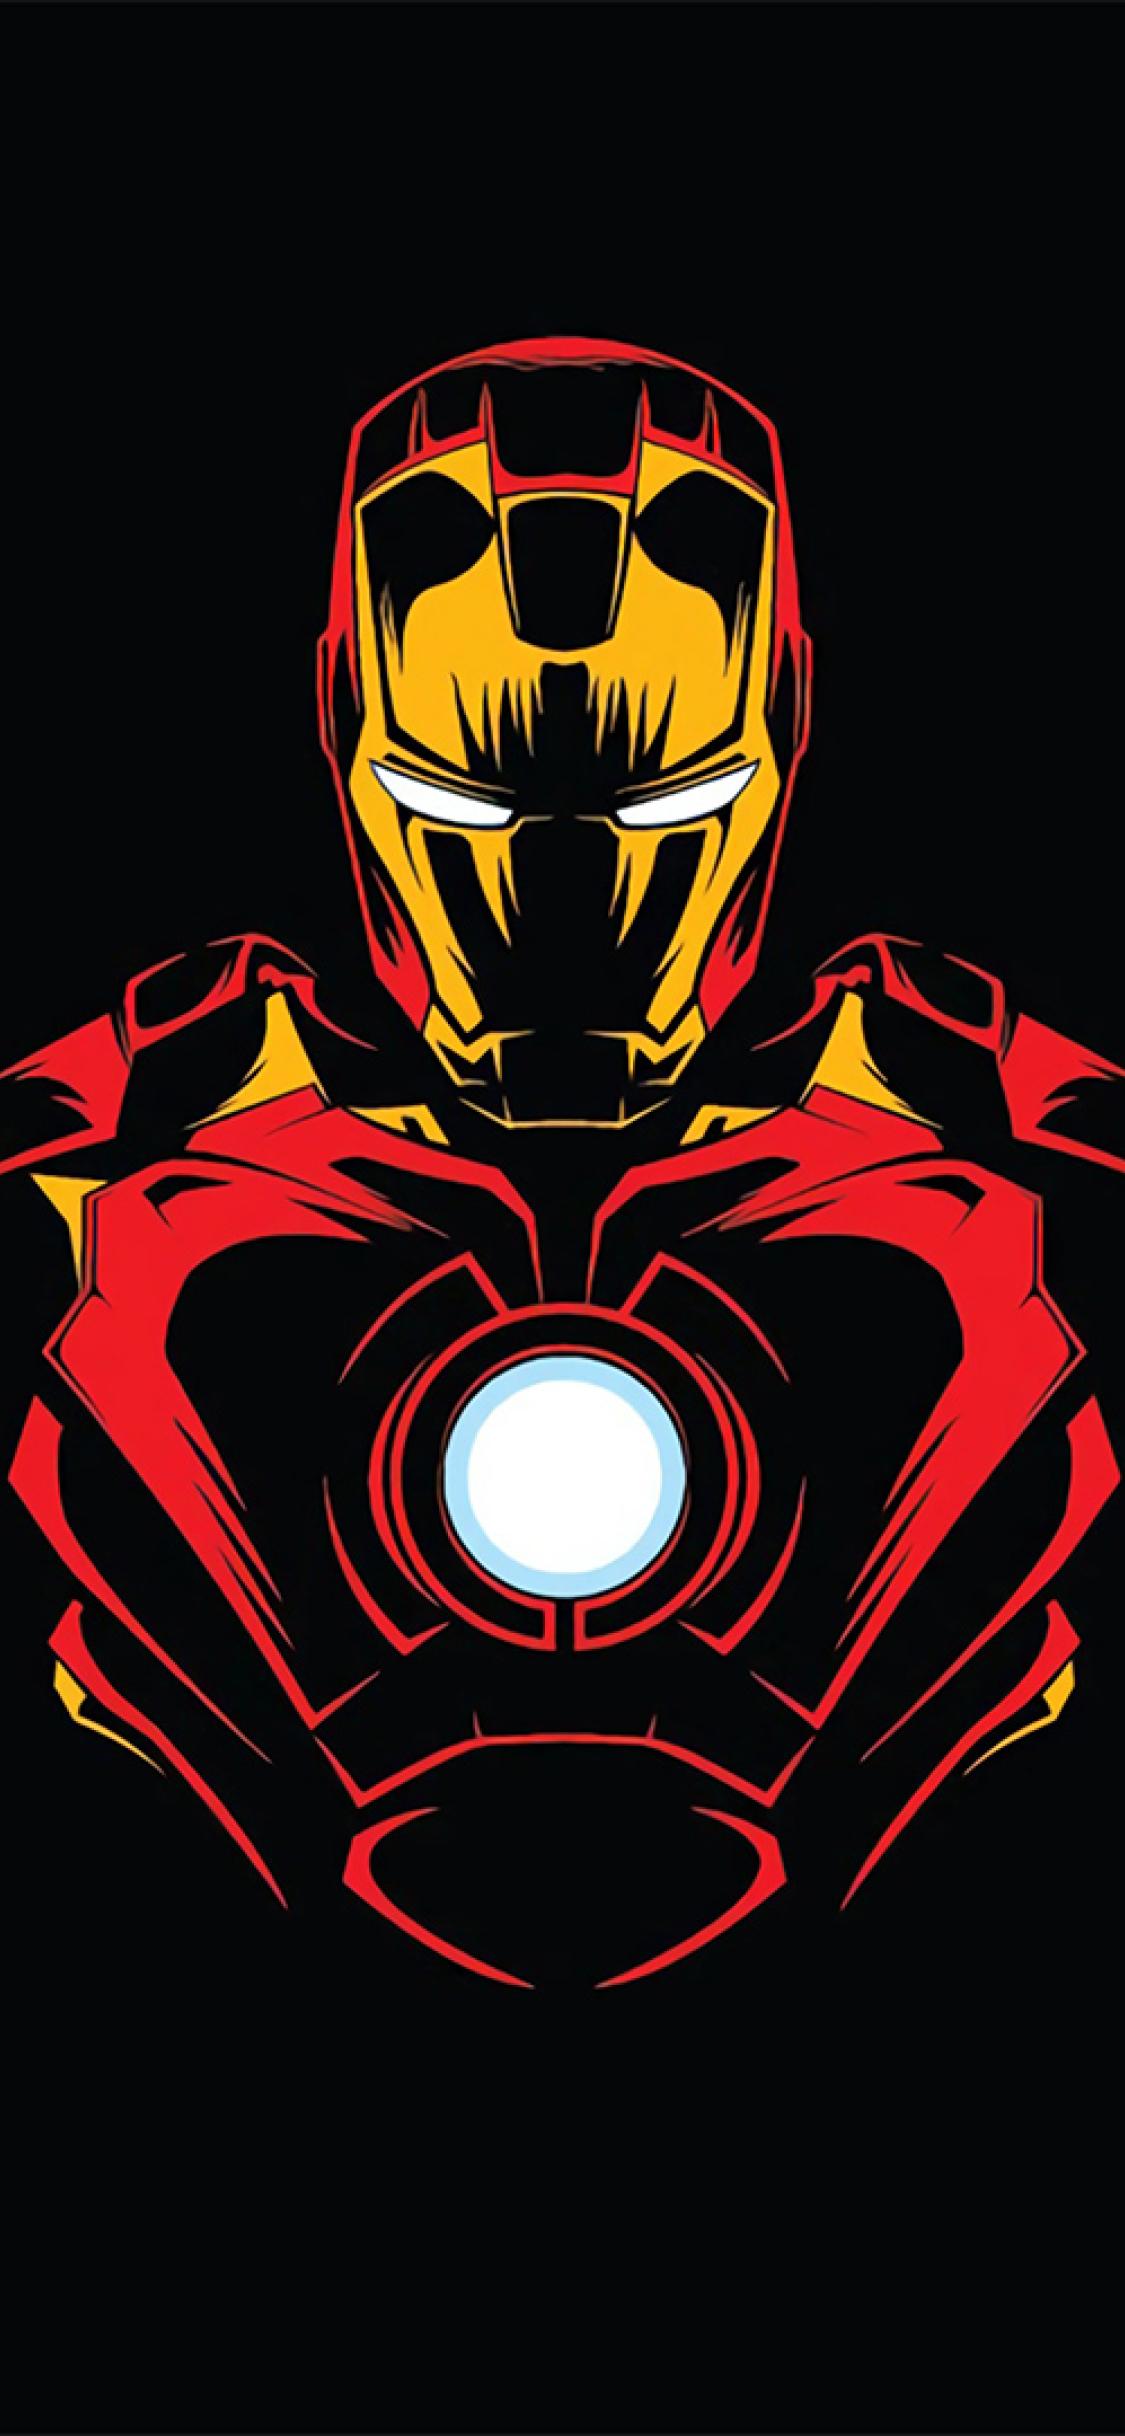 1125x2436 Iron Man Minimalist Iphone XS,Iphone 10,Iphone X ...